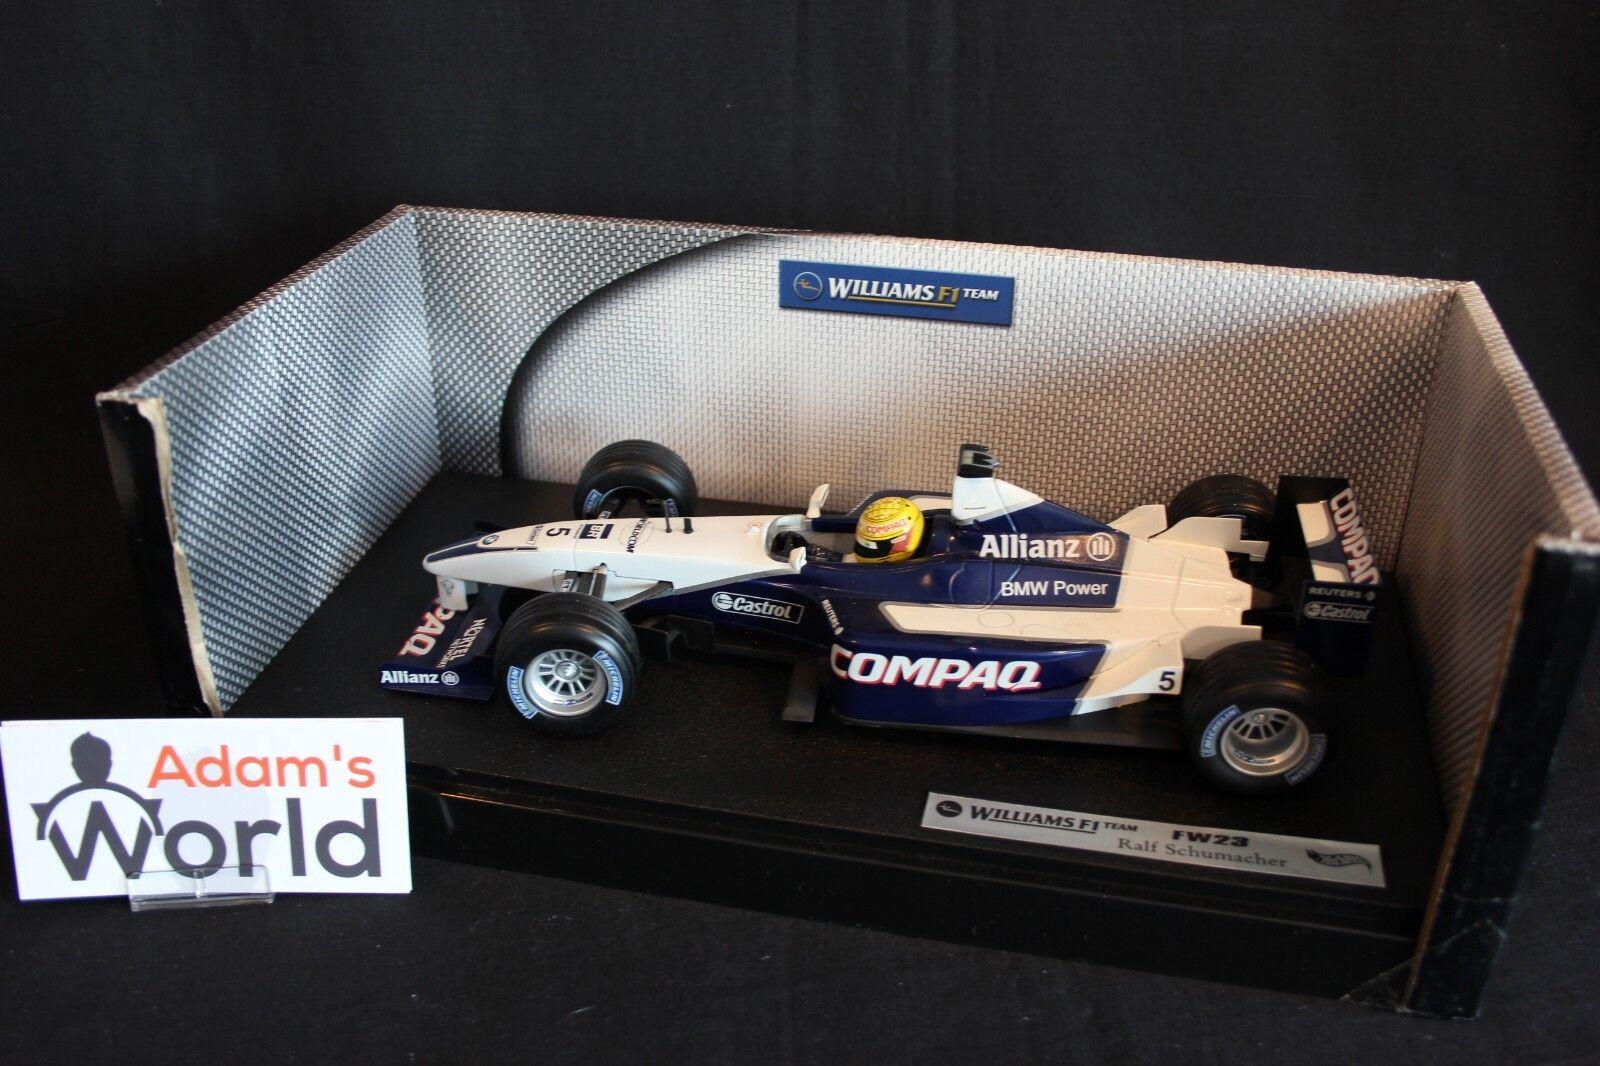 Hot Wheels Williams BMW FW23 2001 1 1 1 18 Ralf Schumacher (GER) 96388a